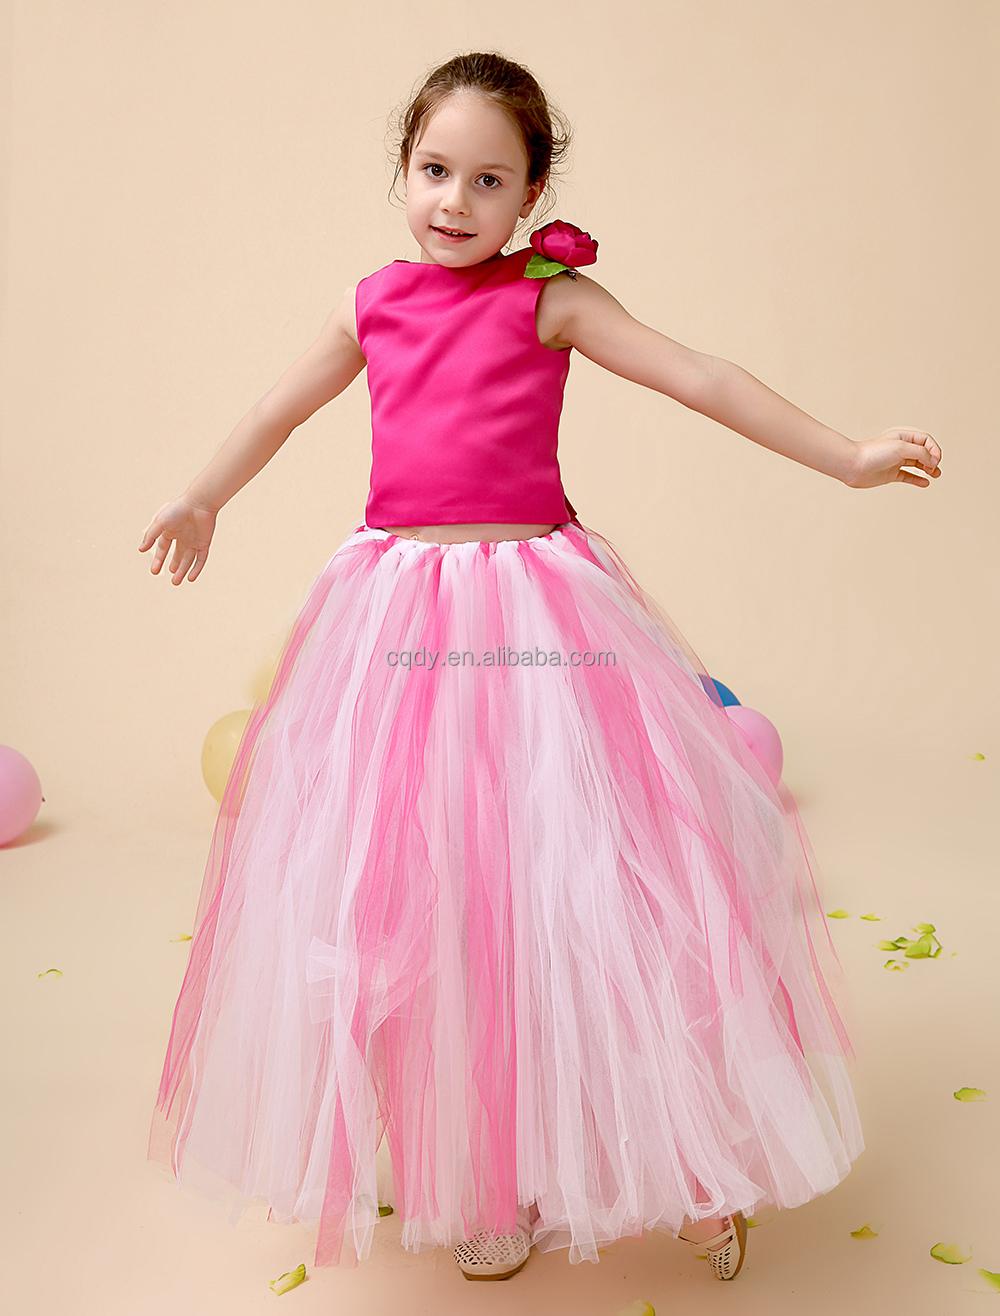 2015 wedding tulle dress frock design for baby girl for Baby girl dresses for weddings